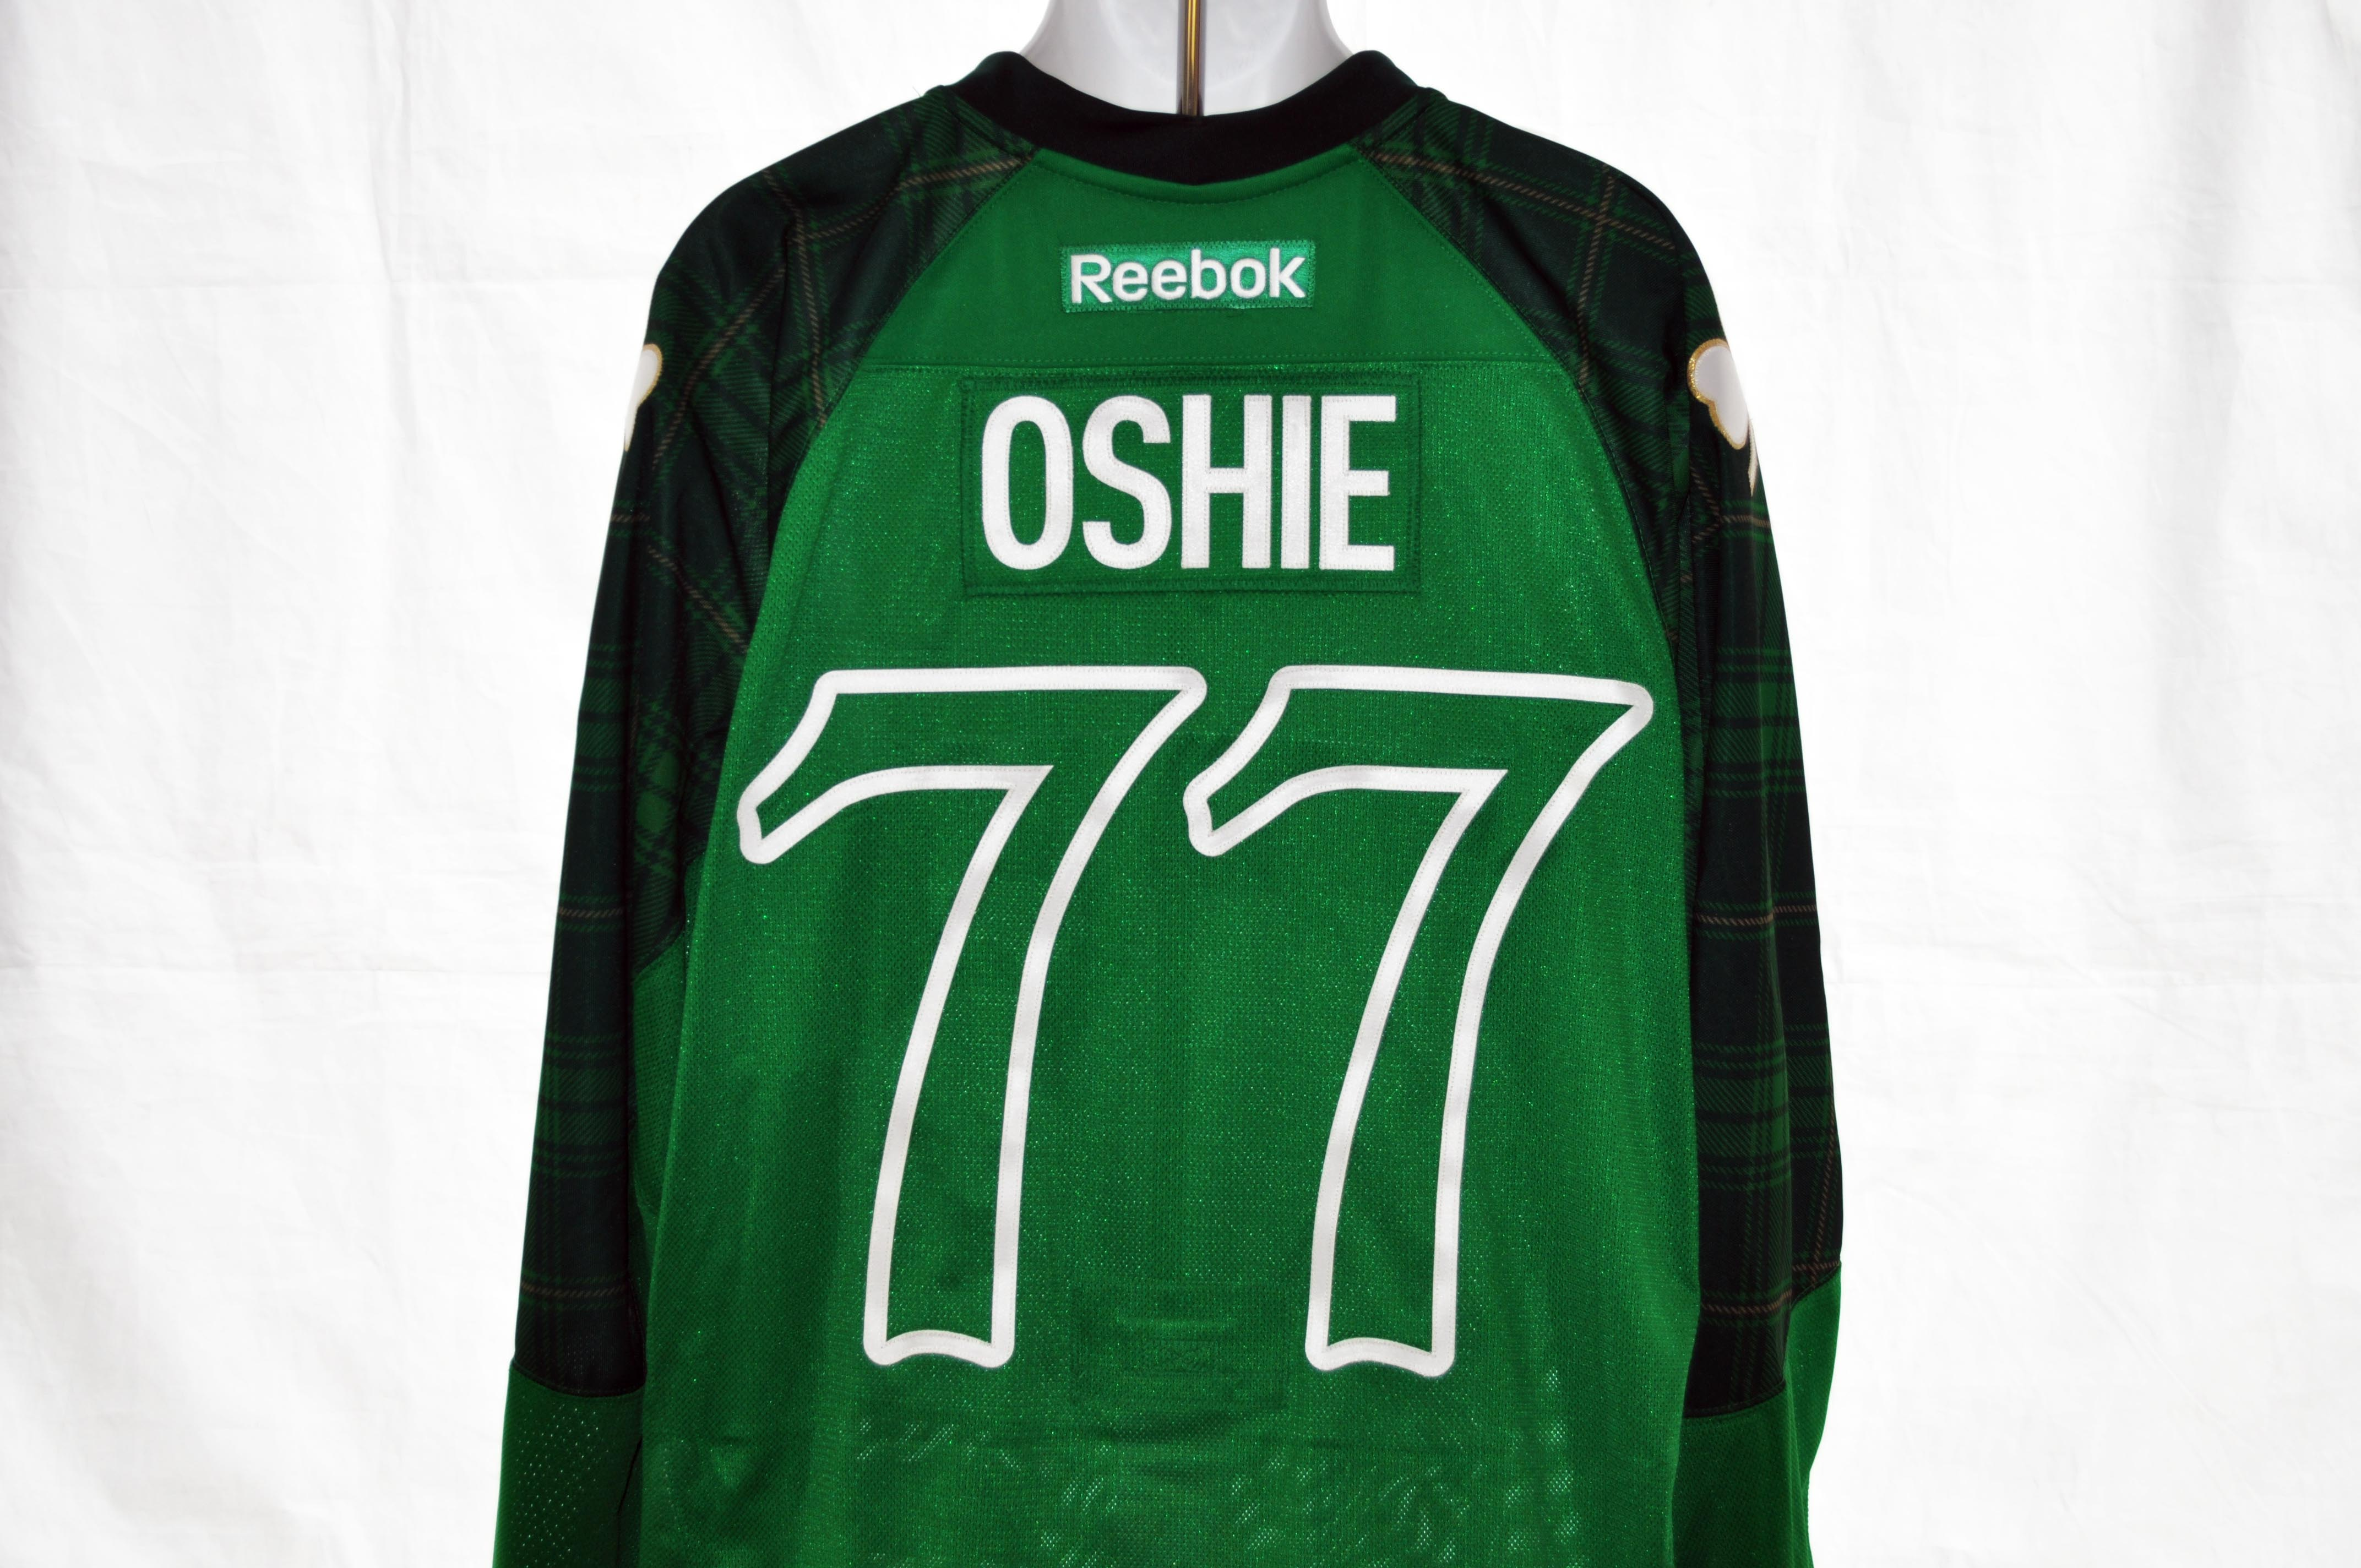 Green Oshie